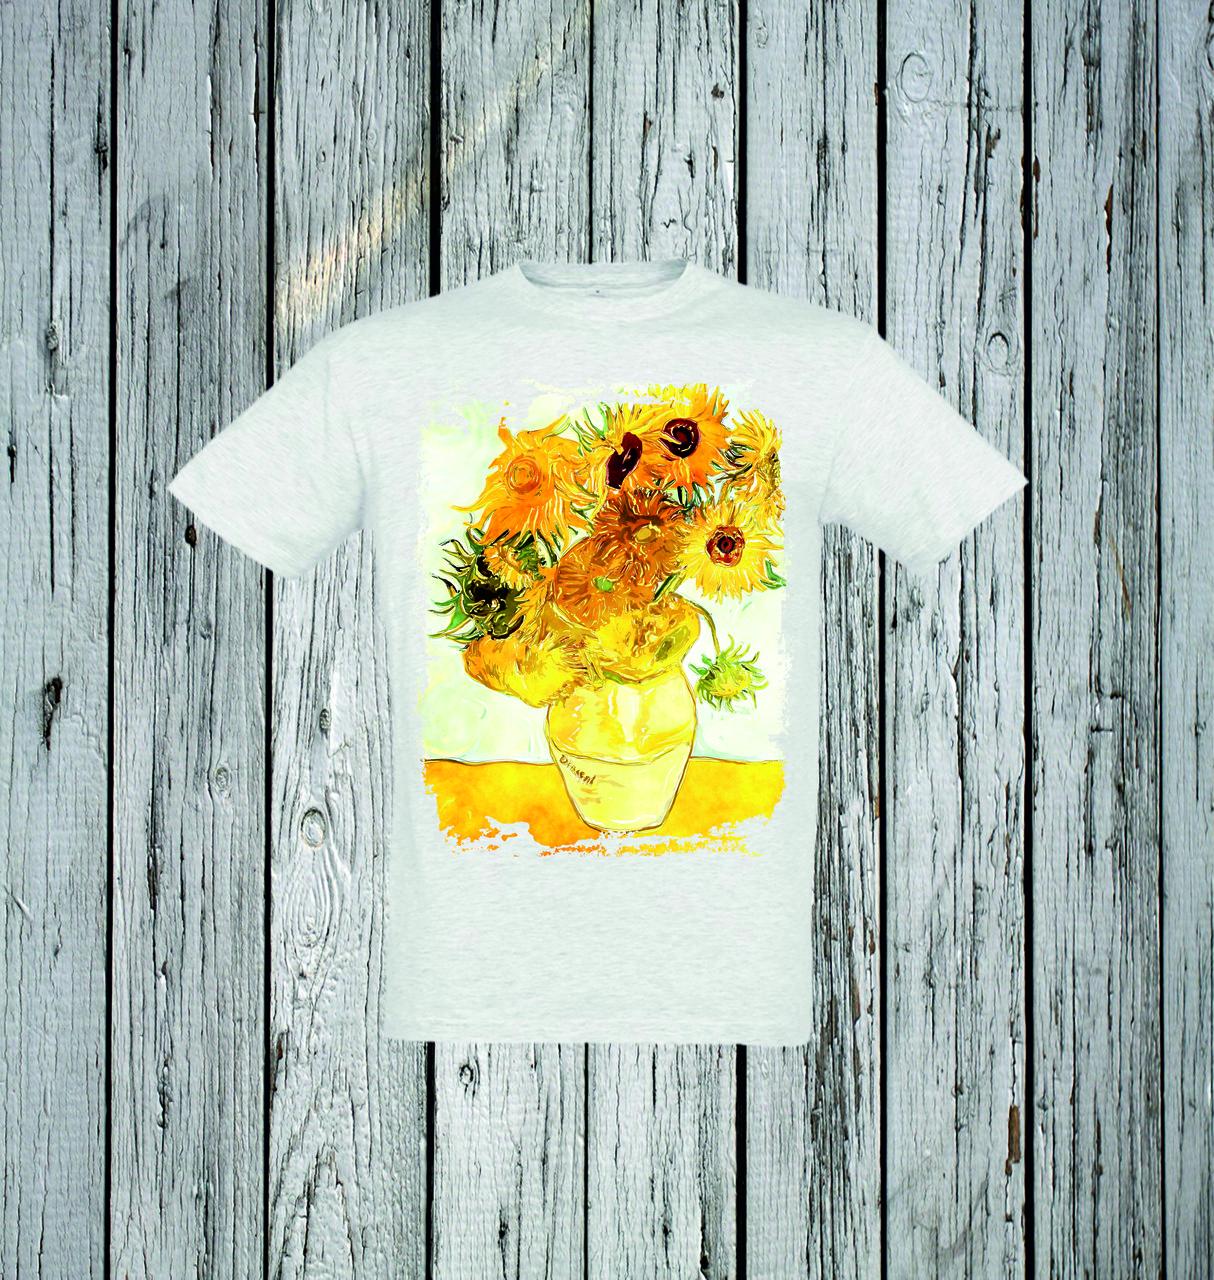 Футболка YOUstyle Sunflower 0166 XXL Light Gray